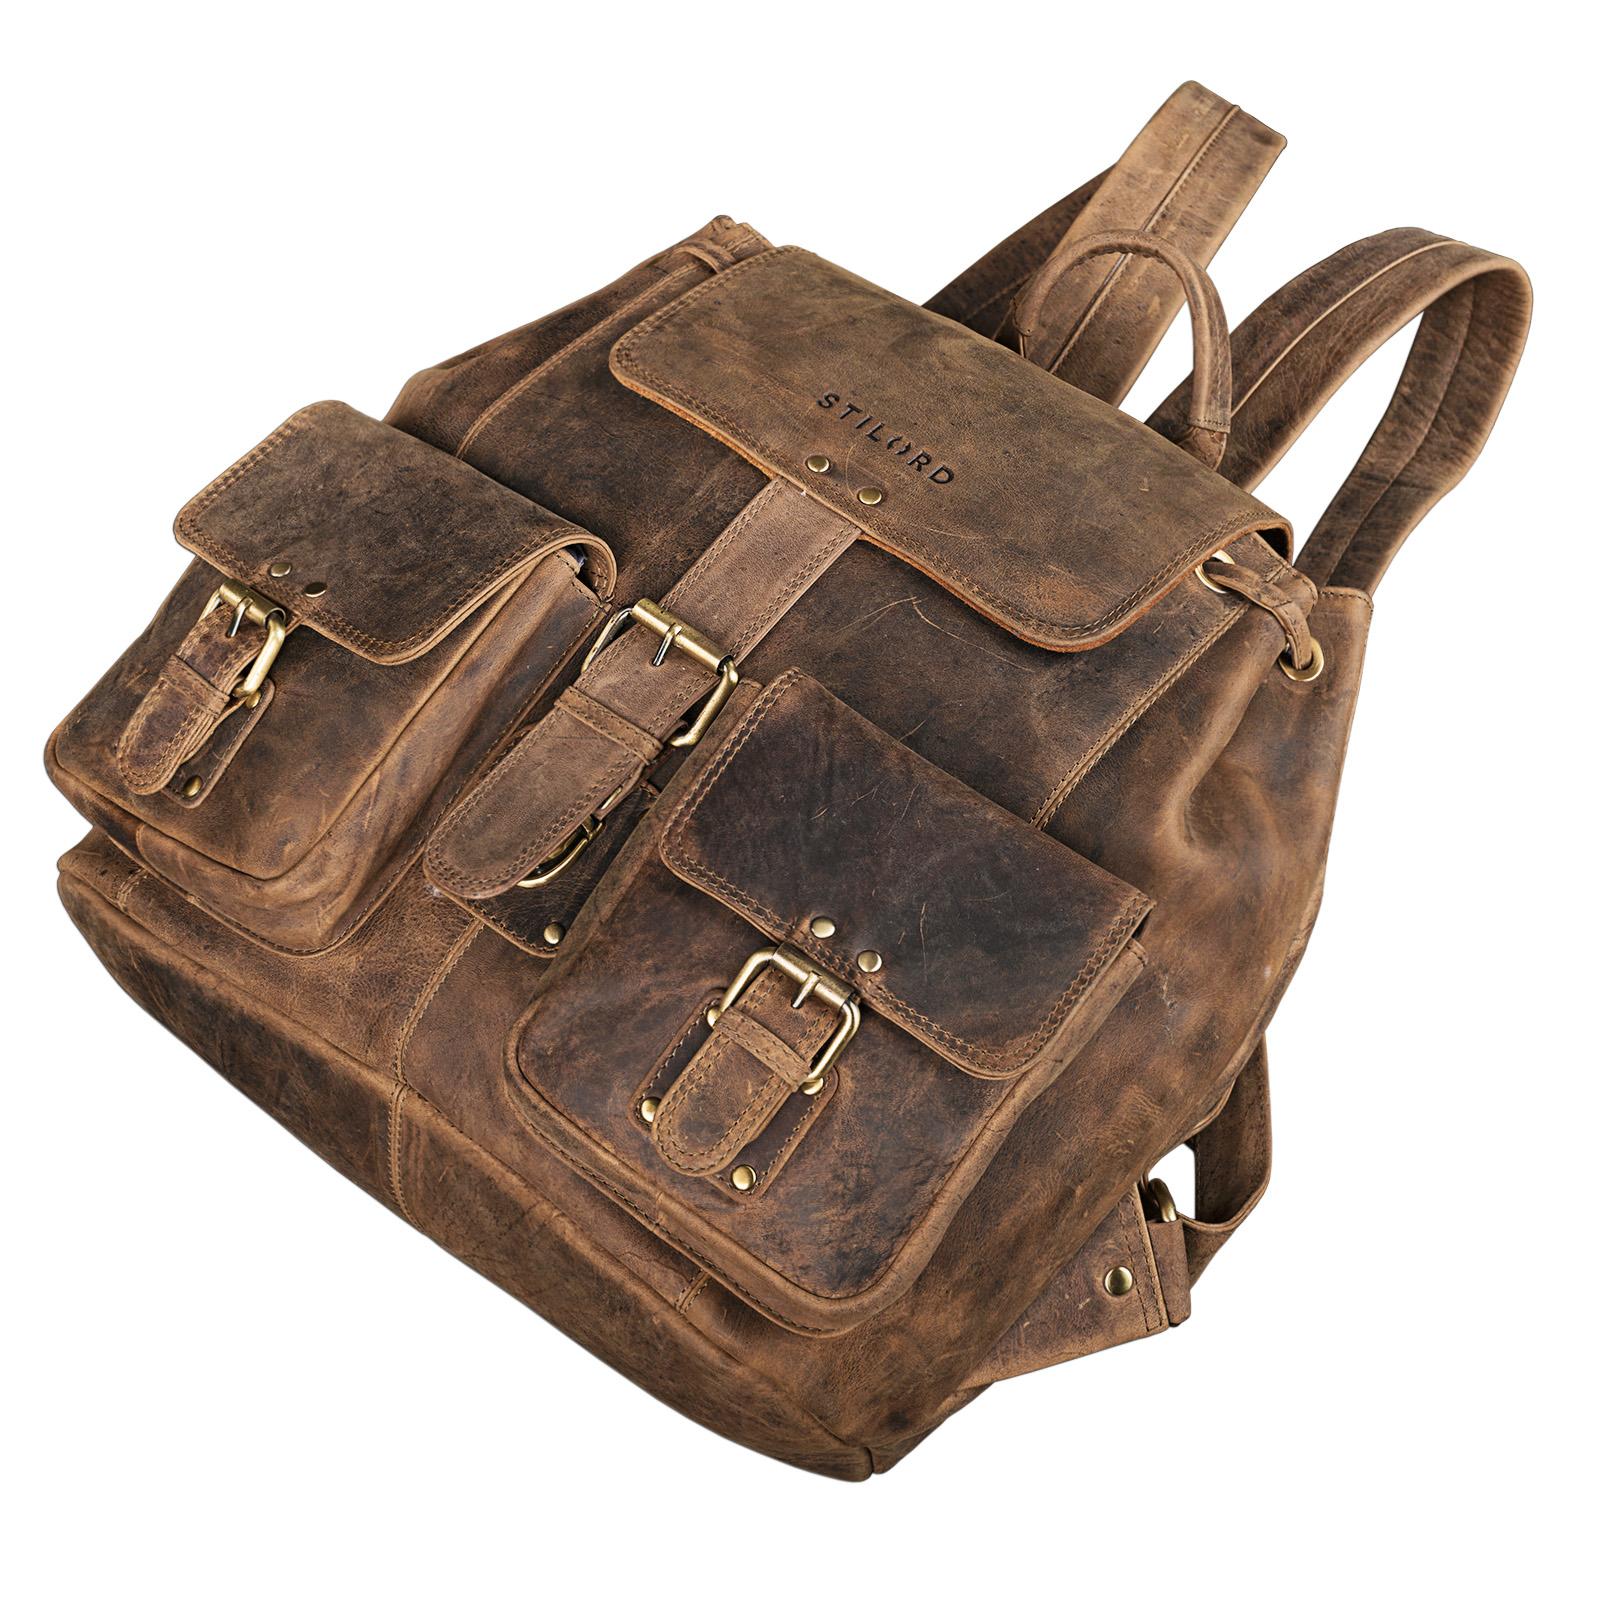 "STILORD ""Larissa"" Vintage Rucksack Leder Damen Rucksackhandtasche Lederrucksack Handtasche DIN A4 City Shopping Daypack Schule Uni - Bild 11"